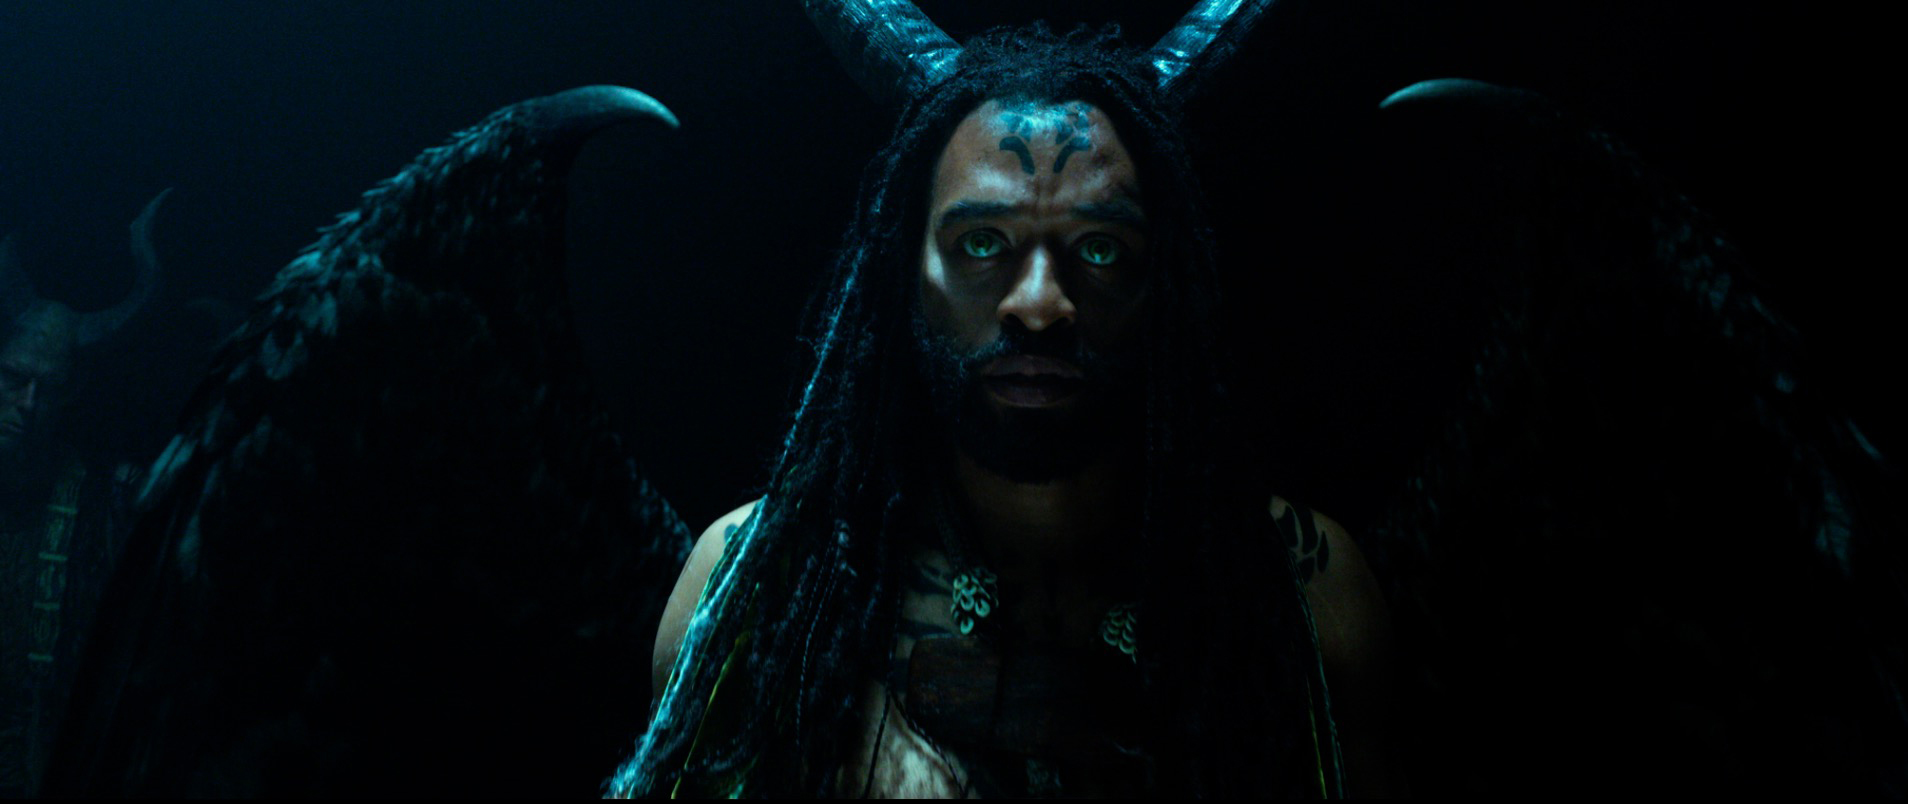 Maleficent Mistress Of Evil Movie Trailer Reviews Mtr